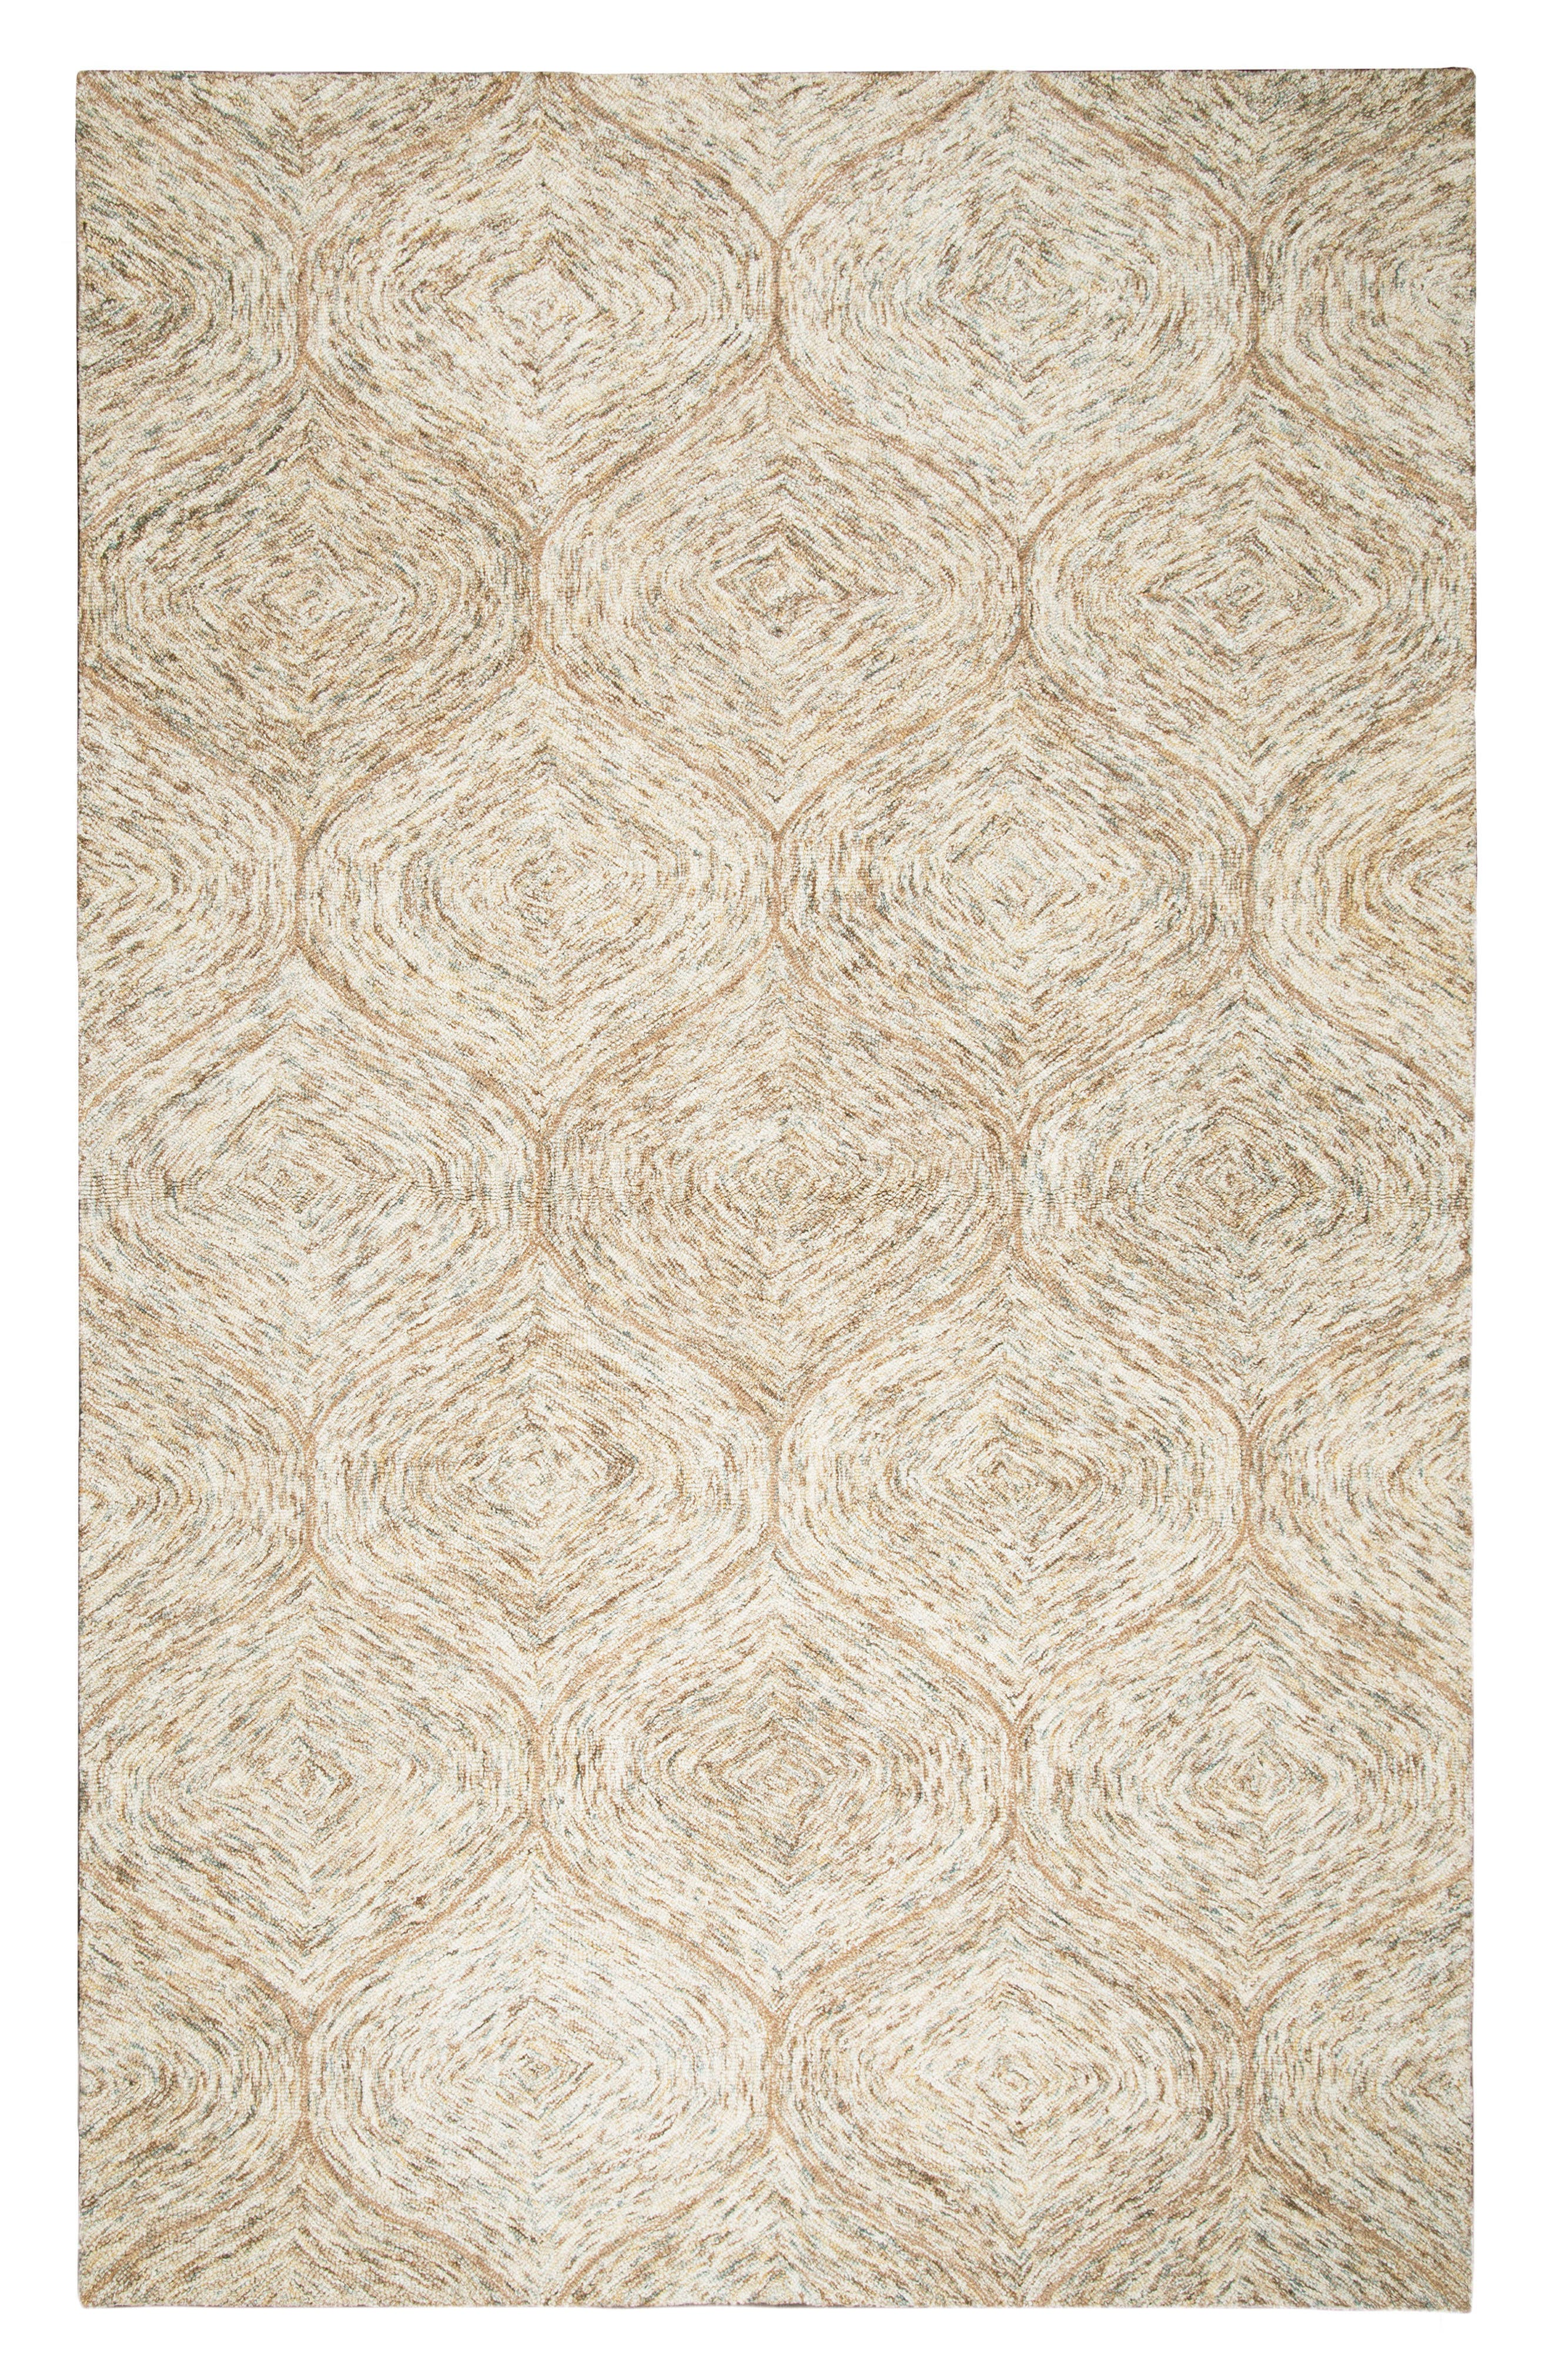 Irregular Diamond Hand Tufted Wool Area Rug,                             Main thumbnail 1, color,                             200